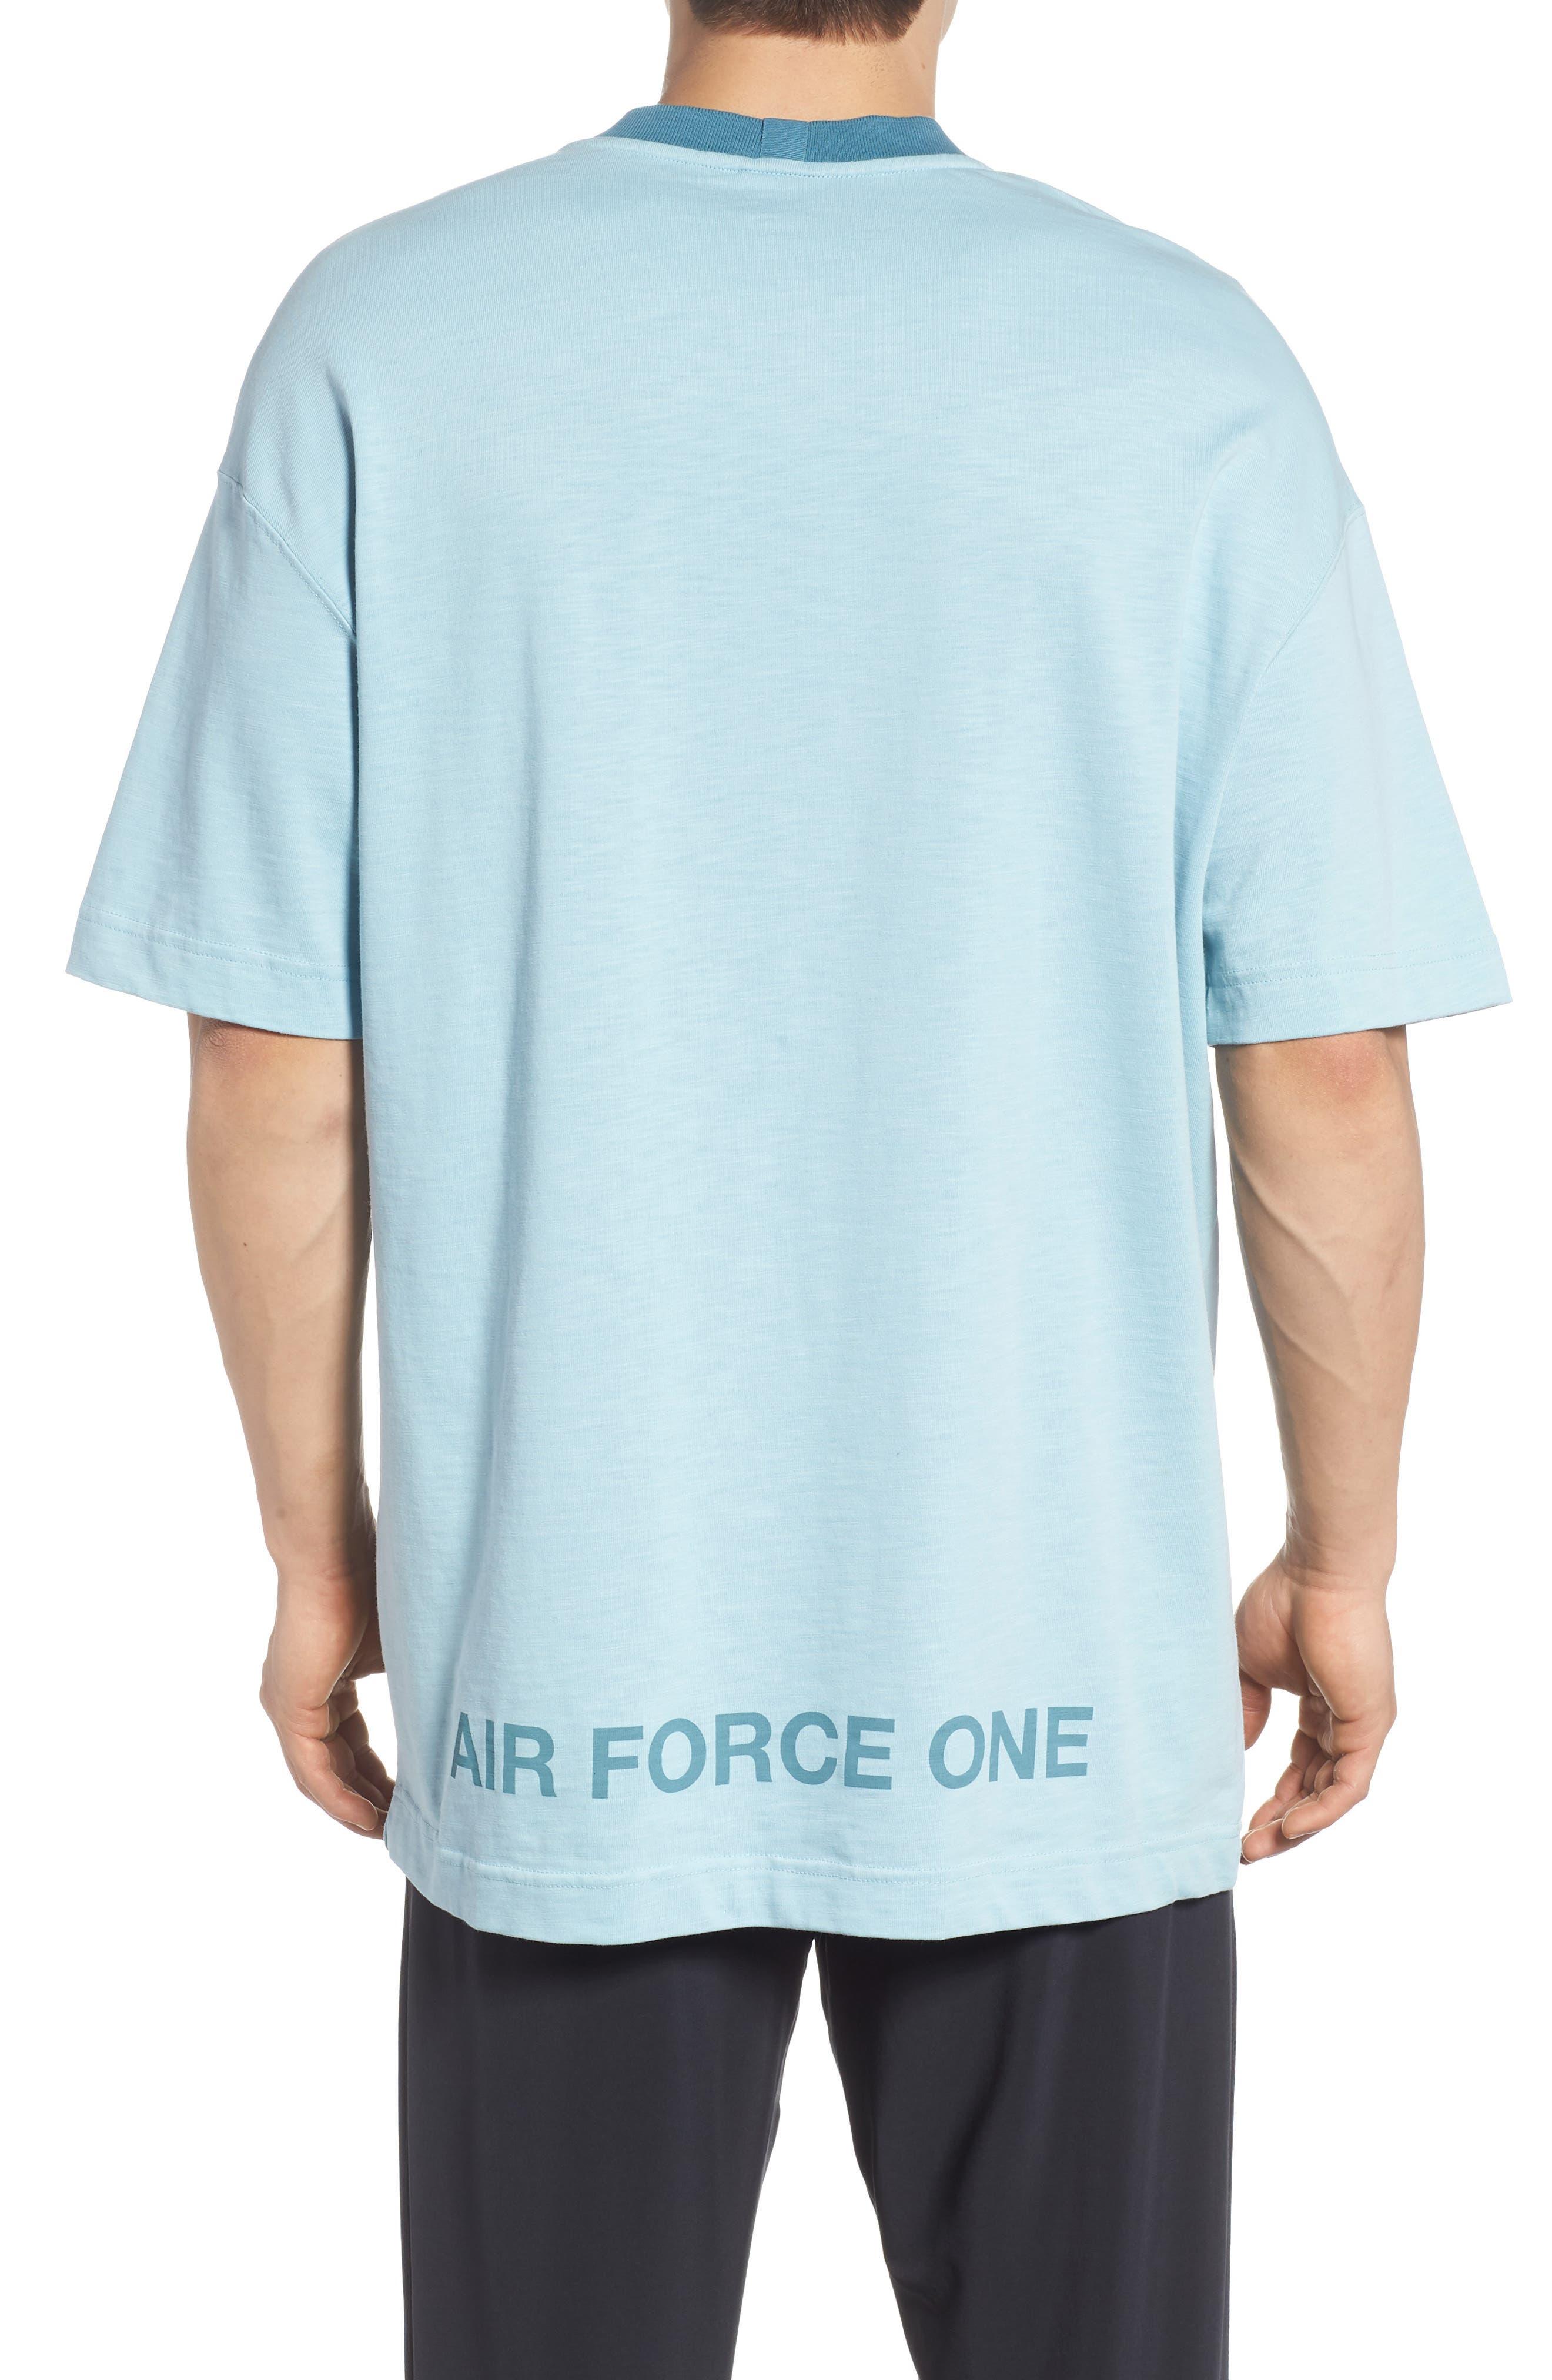 Sportswear AF1 Graphic T-Shirt,                             Alternate thumbnail 2, color,                             Ocean Bliss/ Noise Aqua